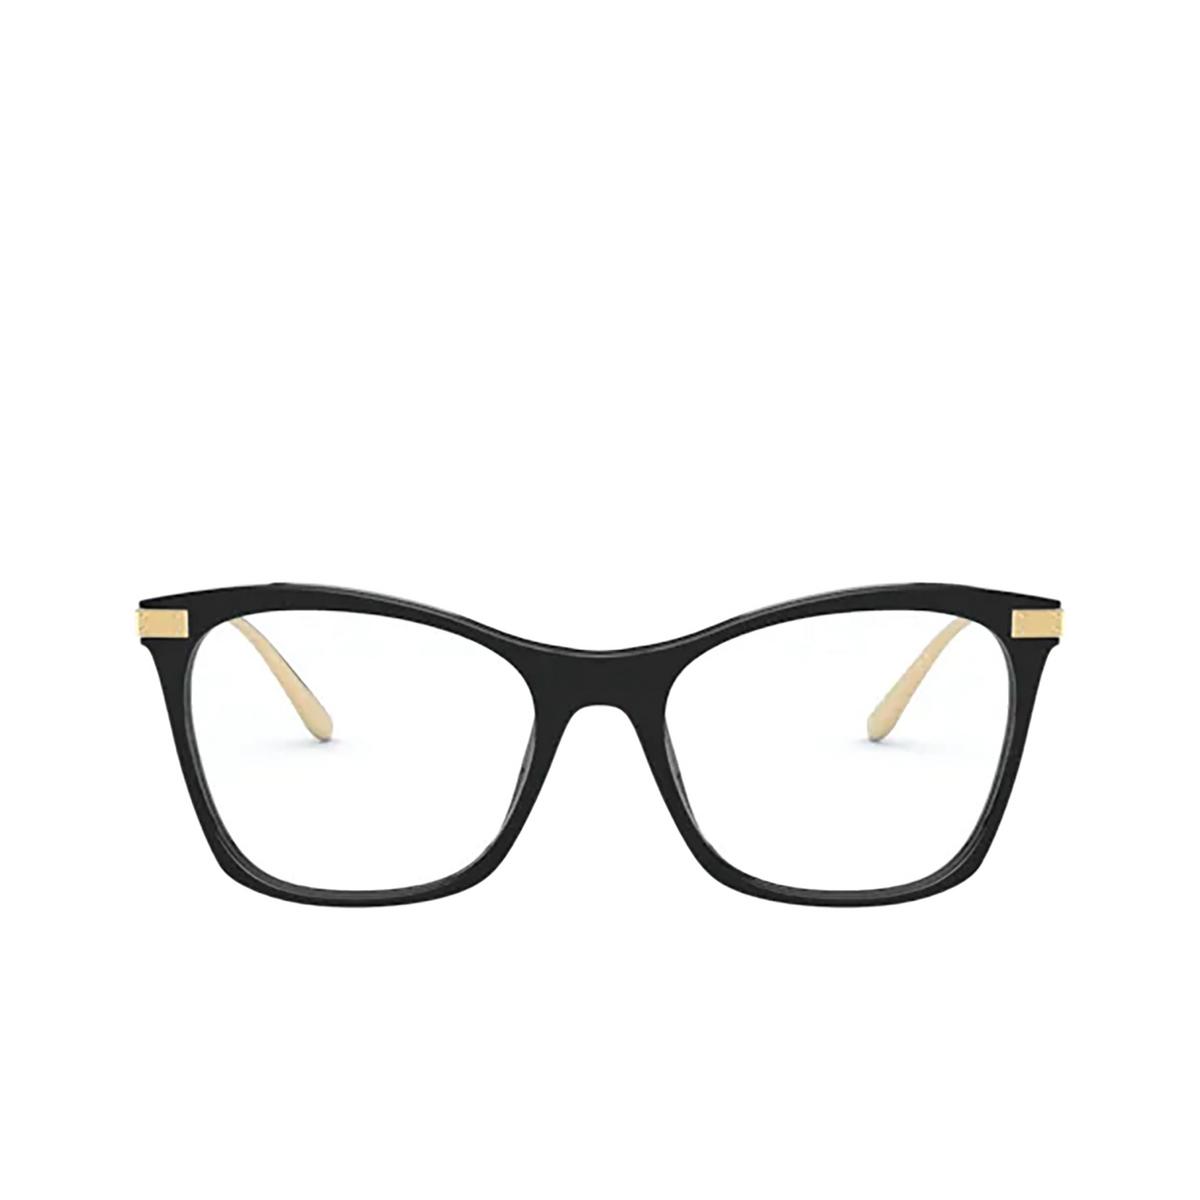 Dolce & Gabbana® Square Eyeglasses: DG3331 color Black 501 - front view.